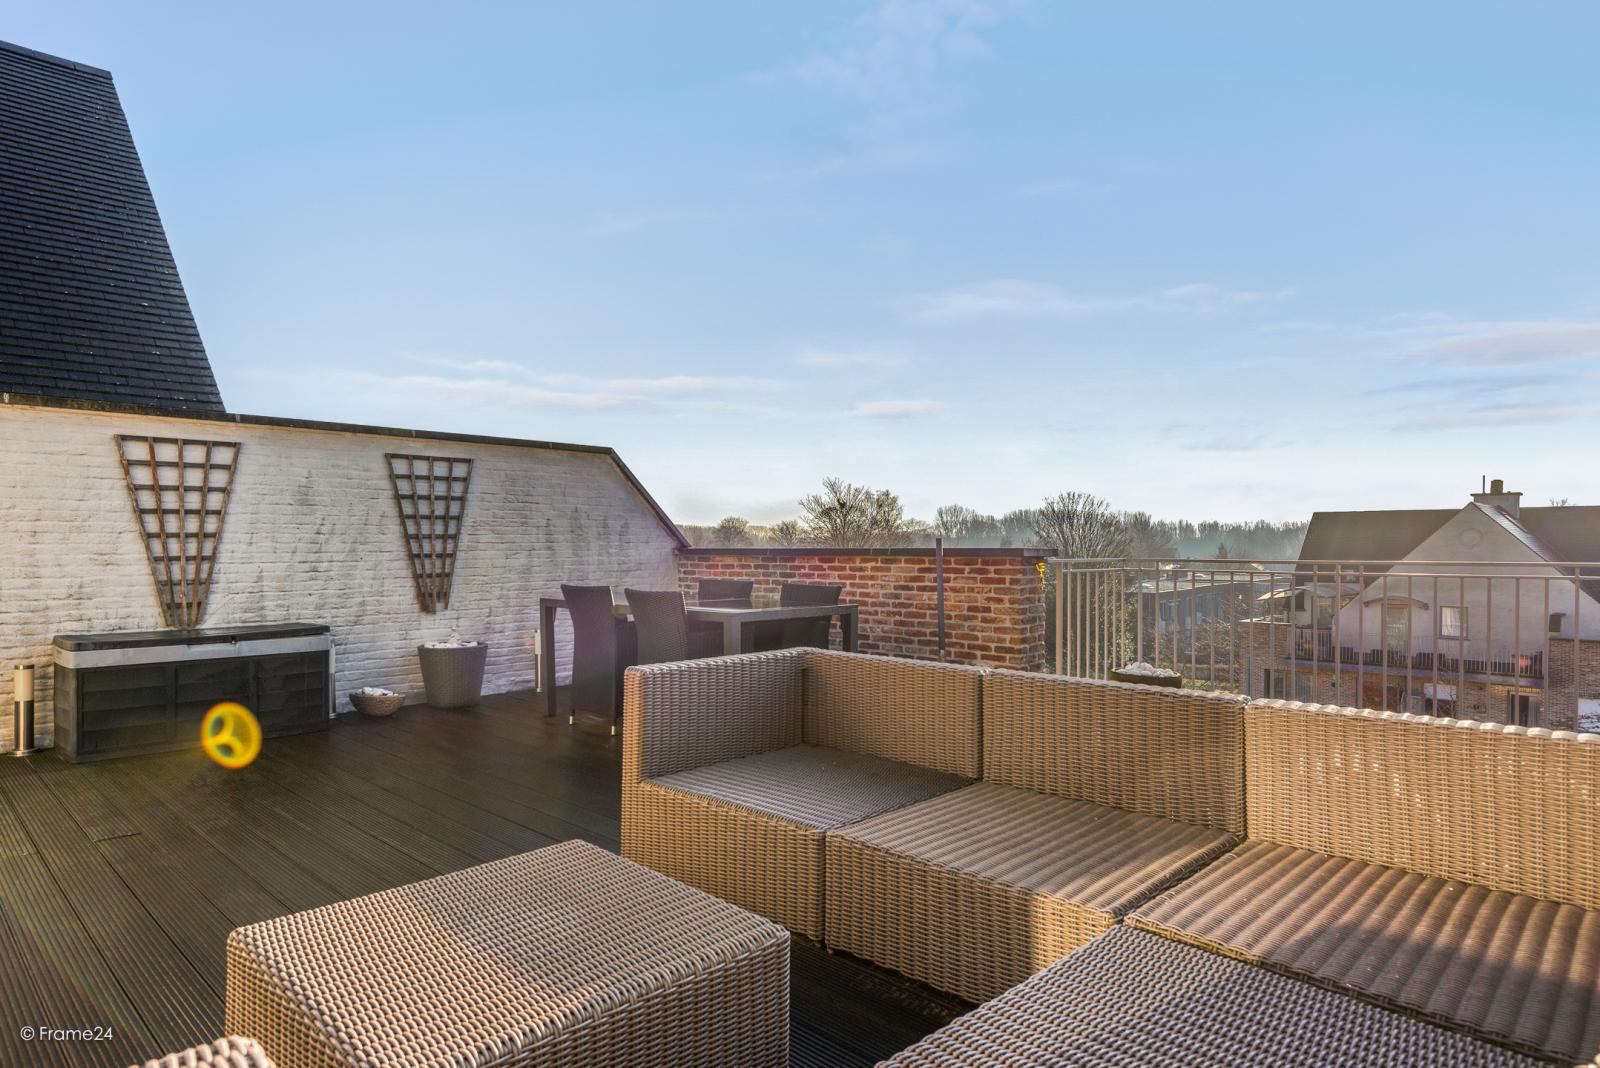 Riant dakappartement (130 m²) met zonnig terras in residentie 'Eyserhof' te Wijnegem! afbeelding 15